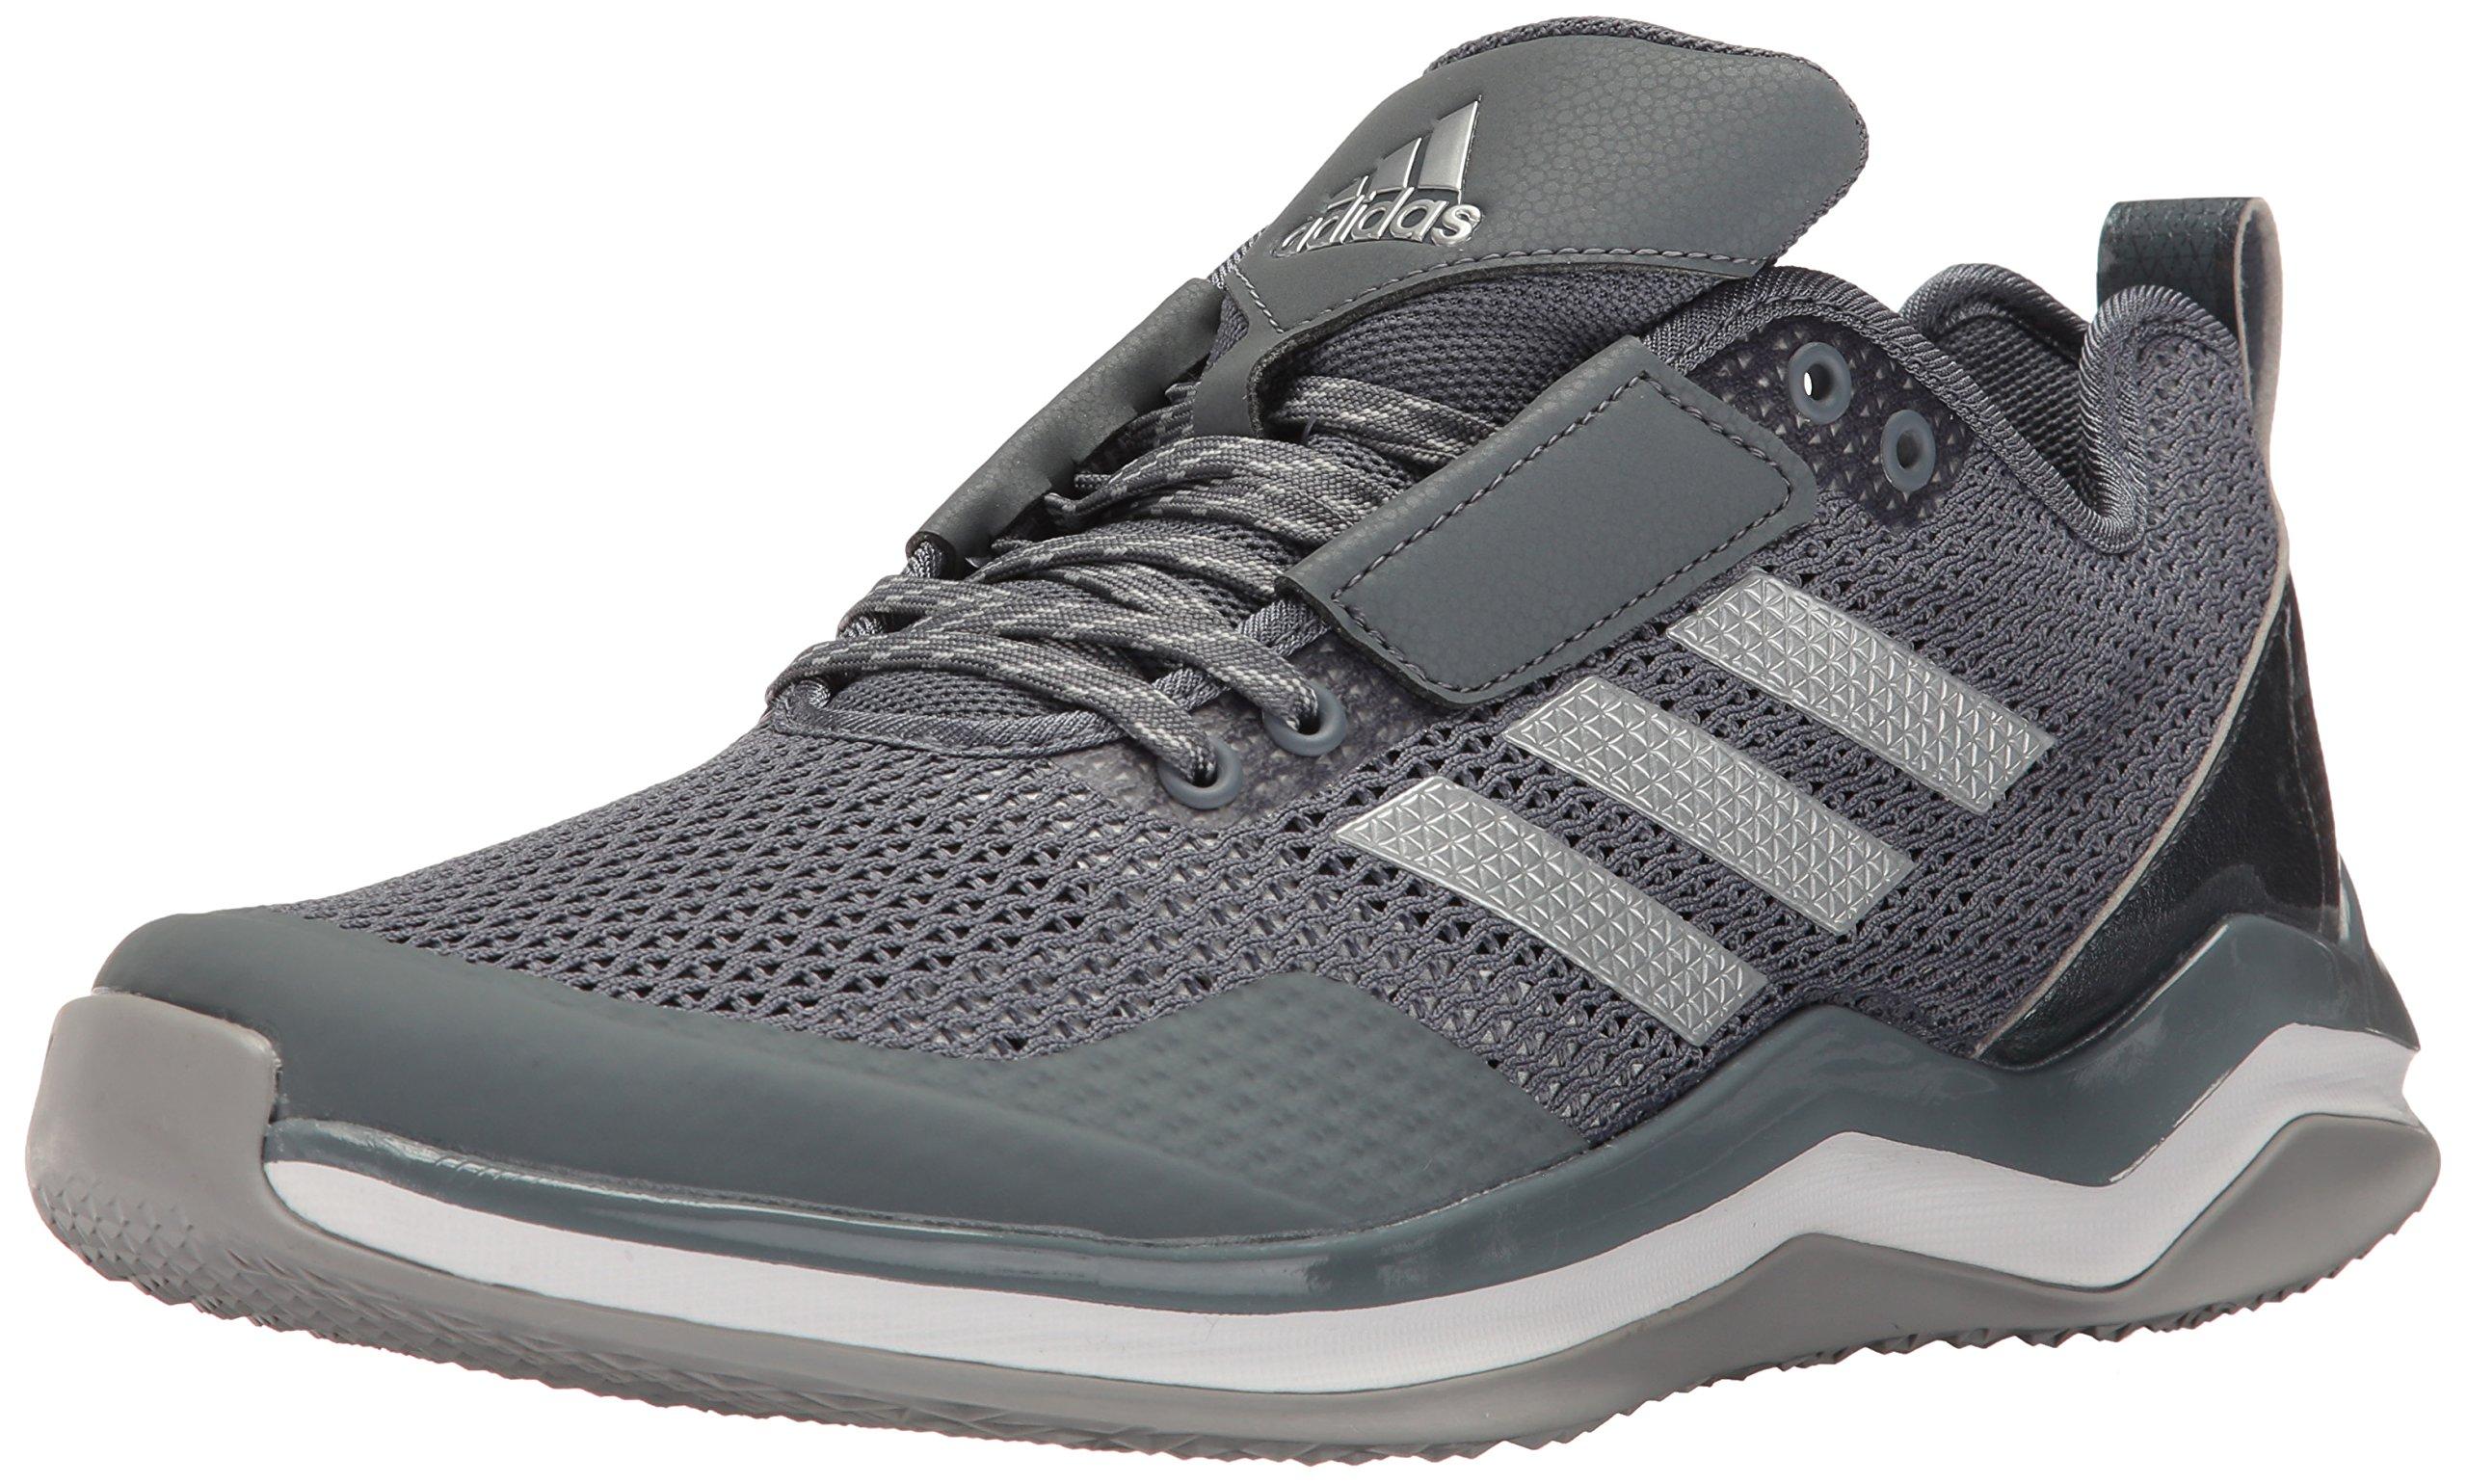 adidas Men's Freak X Carbon Mid Cross Trainer, Onix/Metallic Silver/White, (12 M US)